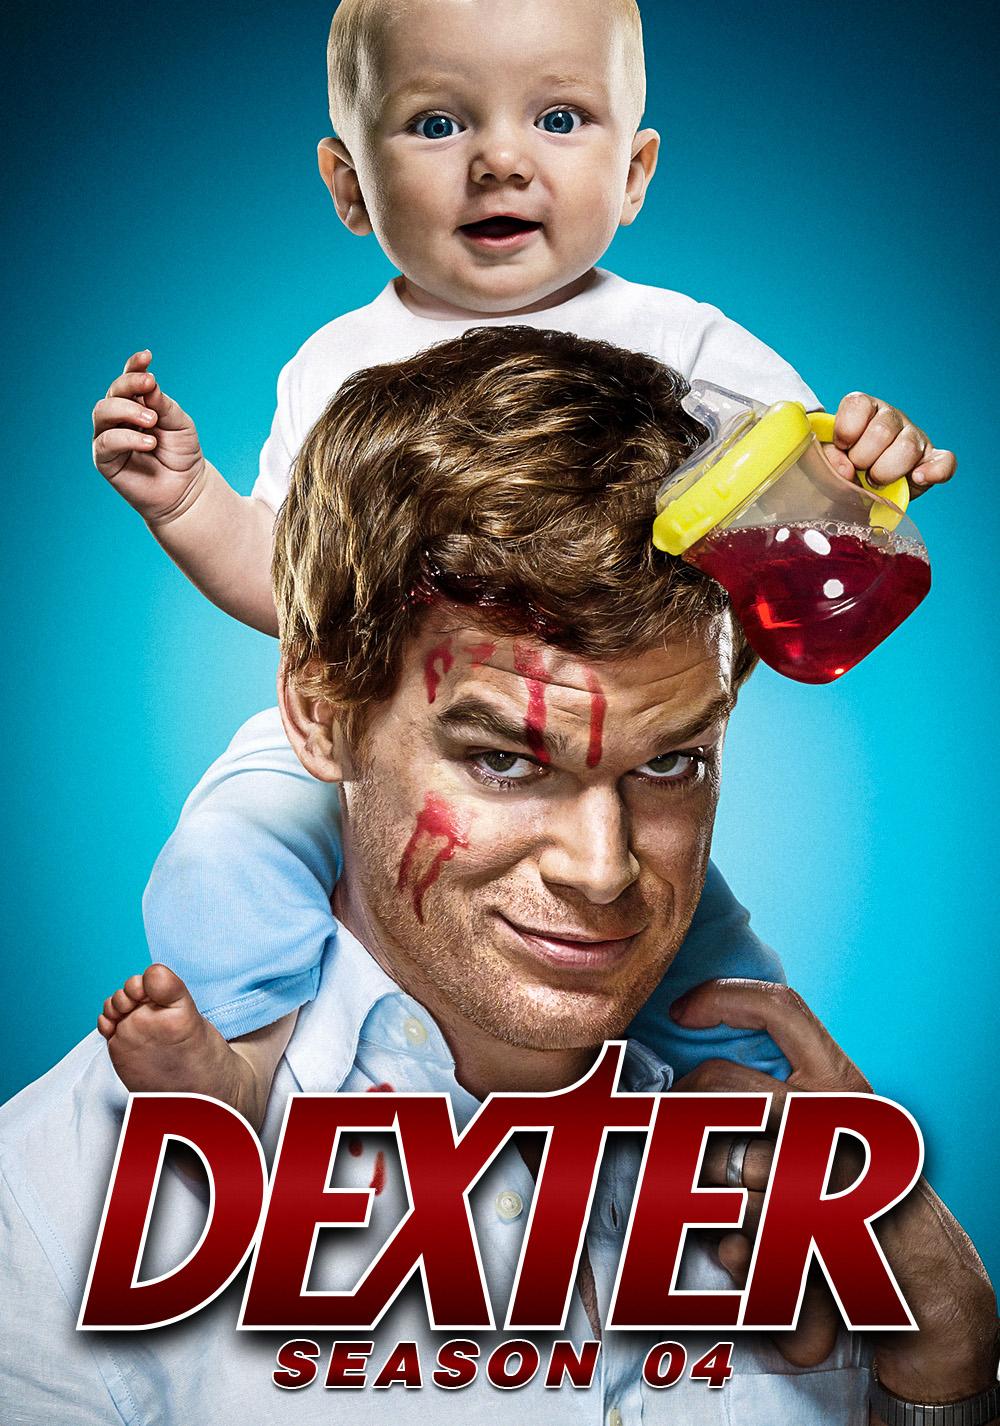 Dexter|Colección 1-8|Latino-Ingles|1080p|96/96|x265 10bit|+ Soundtracks  Season04-poster